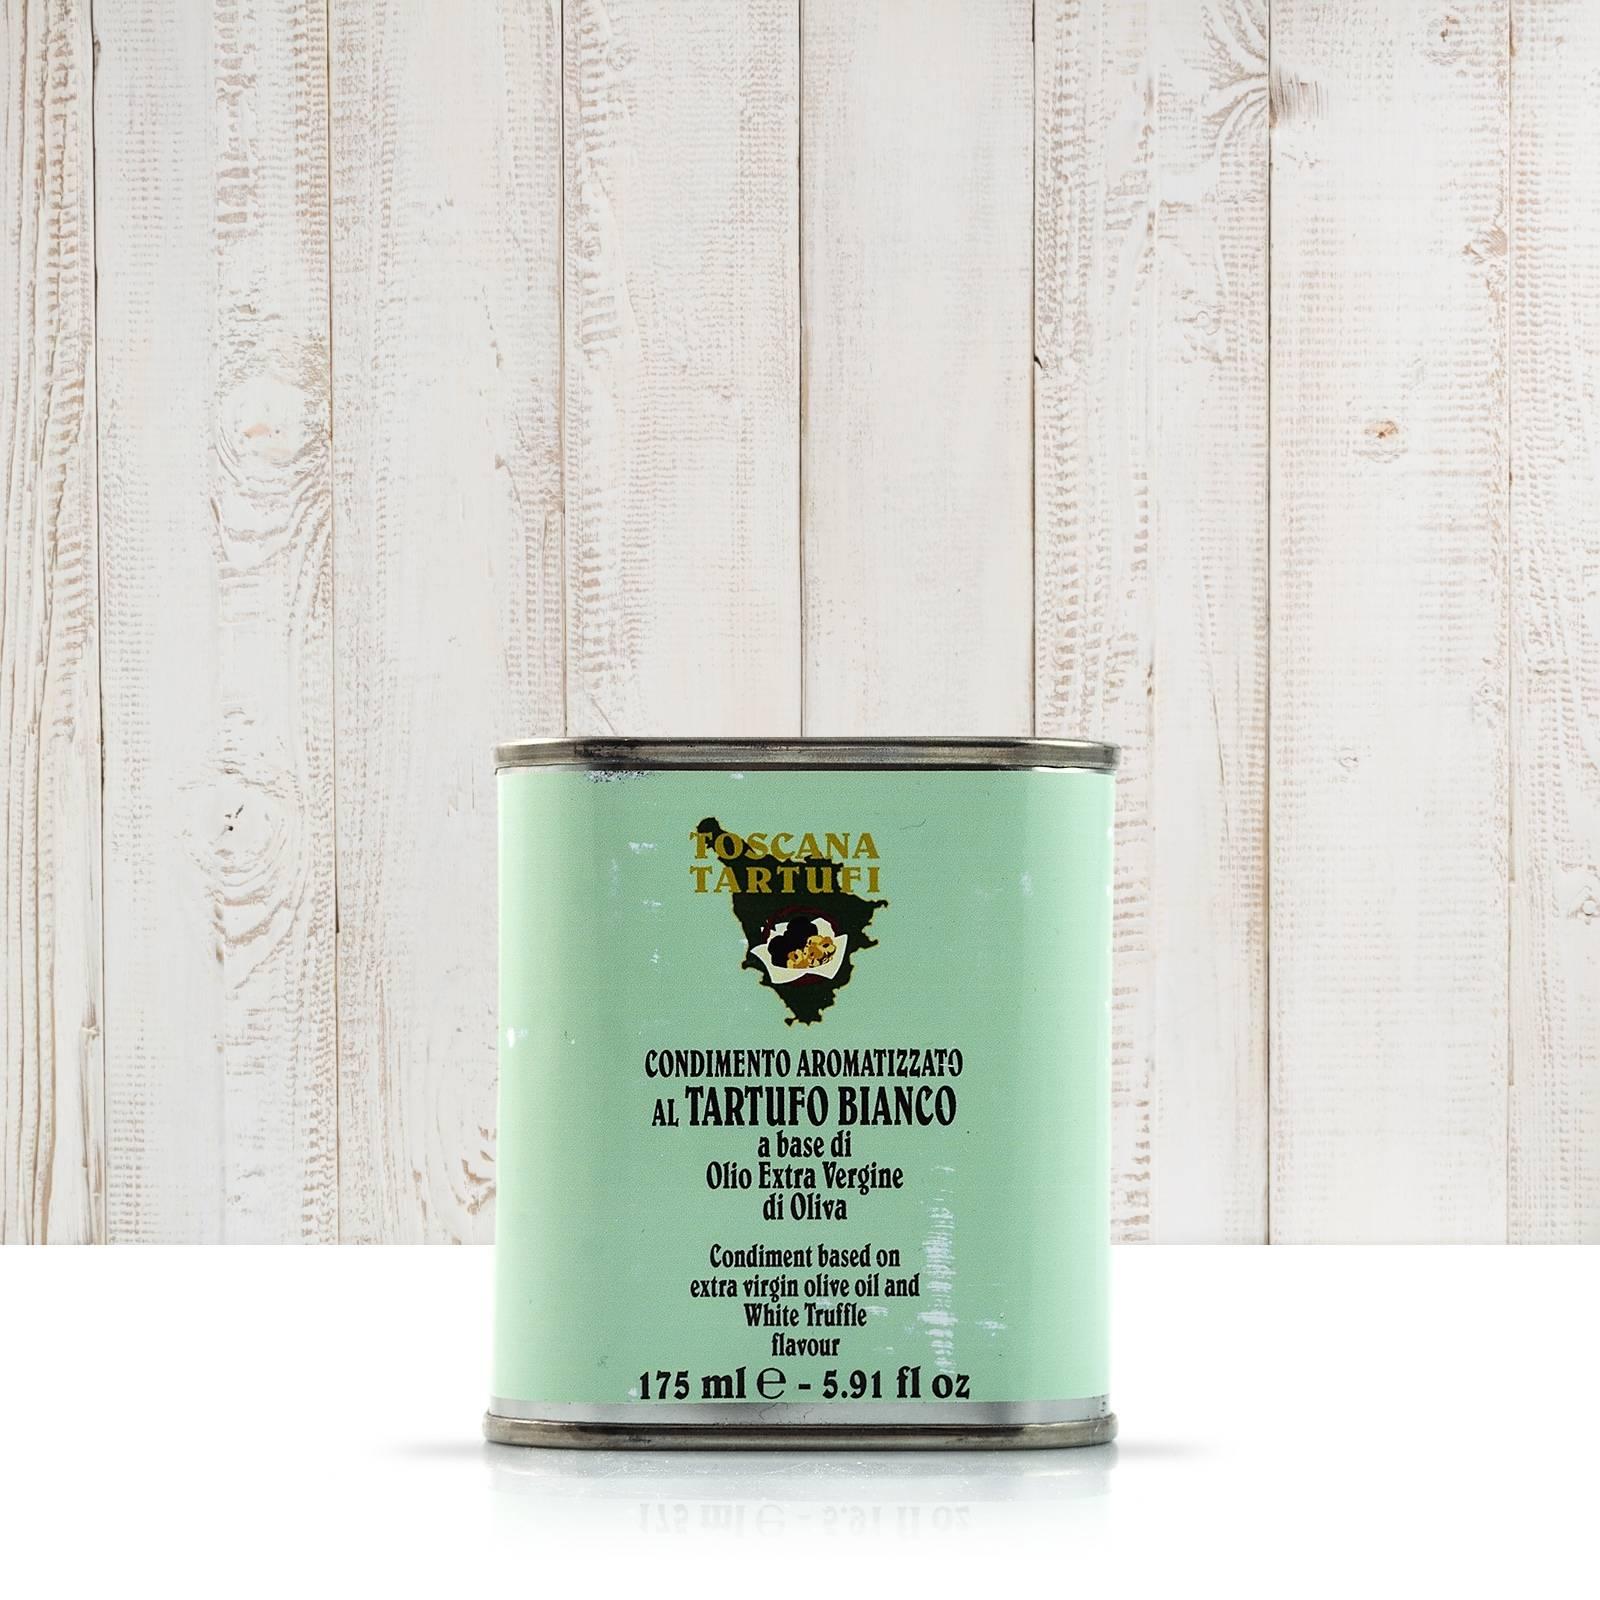 Toscana Tartufi Olio EVO aromatizzato al tartufo bianco - lattina